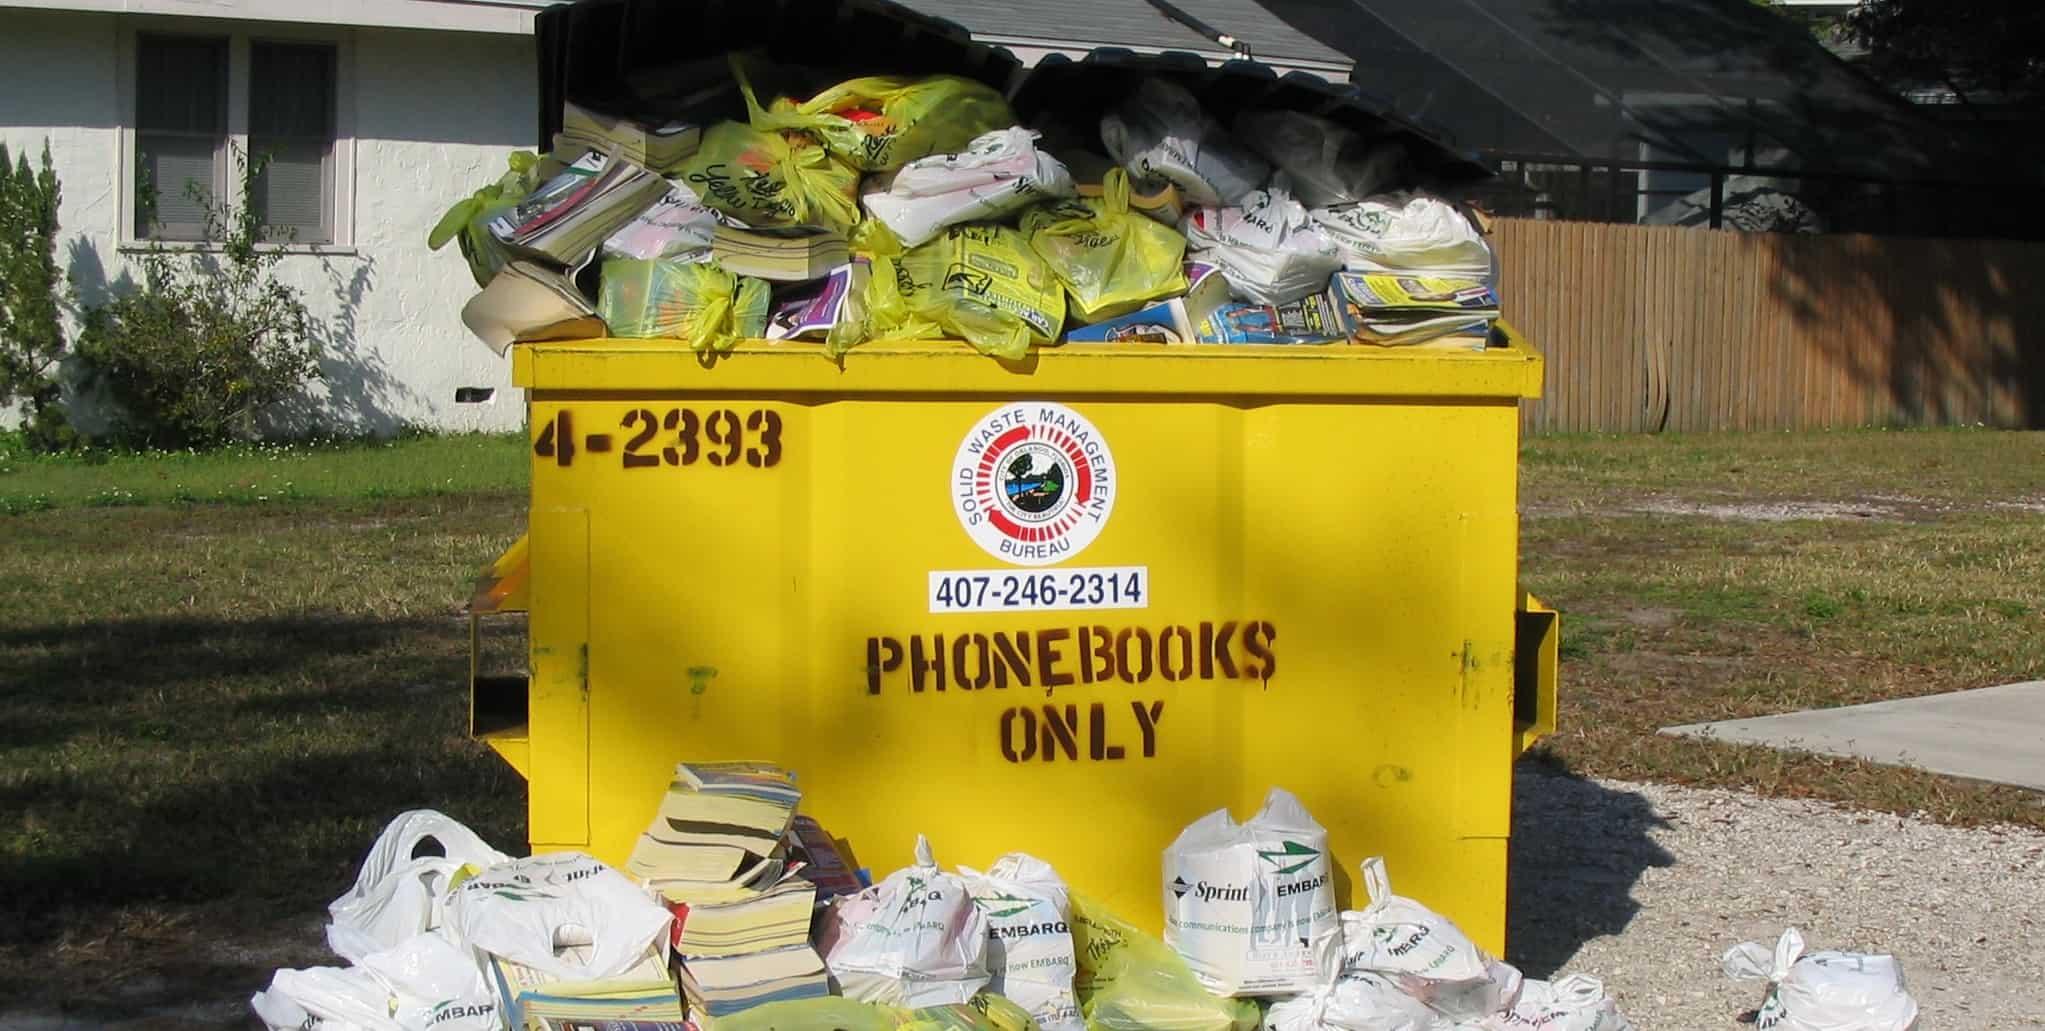 Phonebooks in dumpster